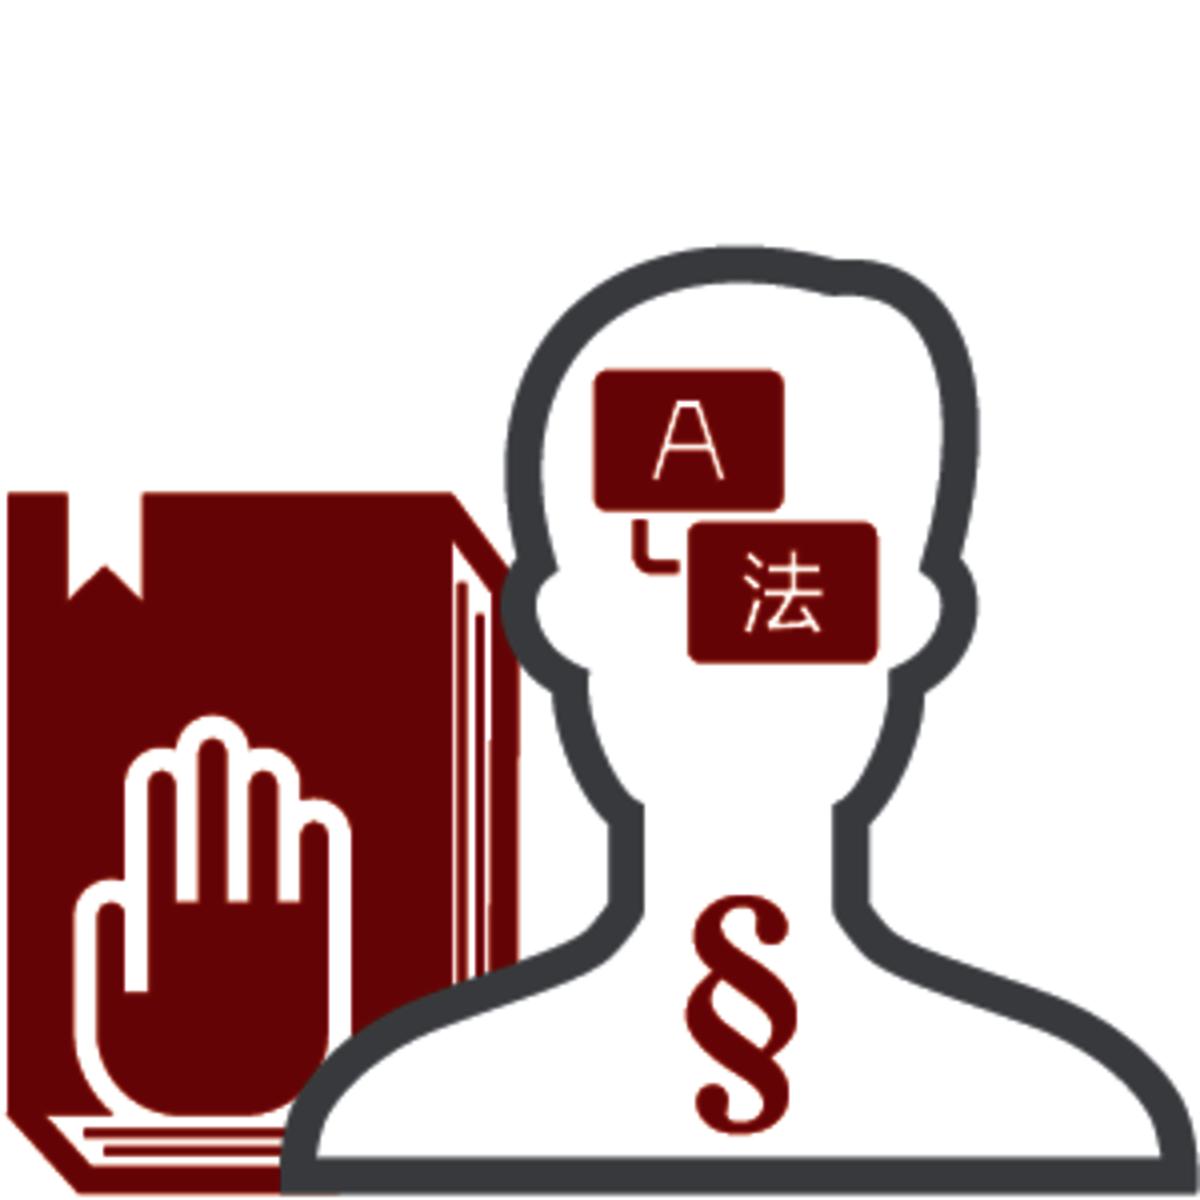 LT Lawtank - Certified translation - Affidavit